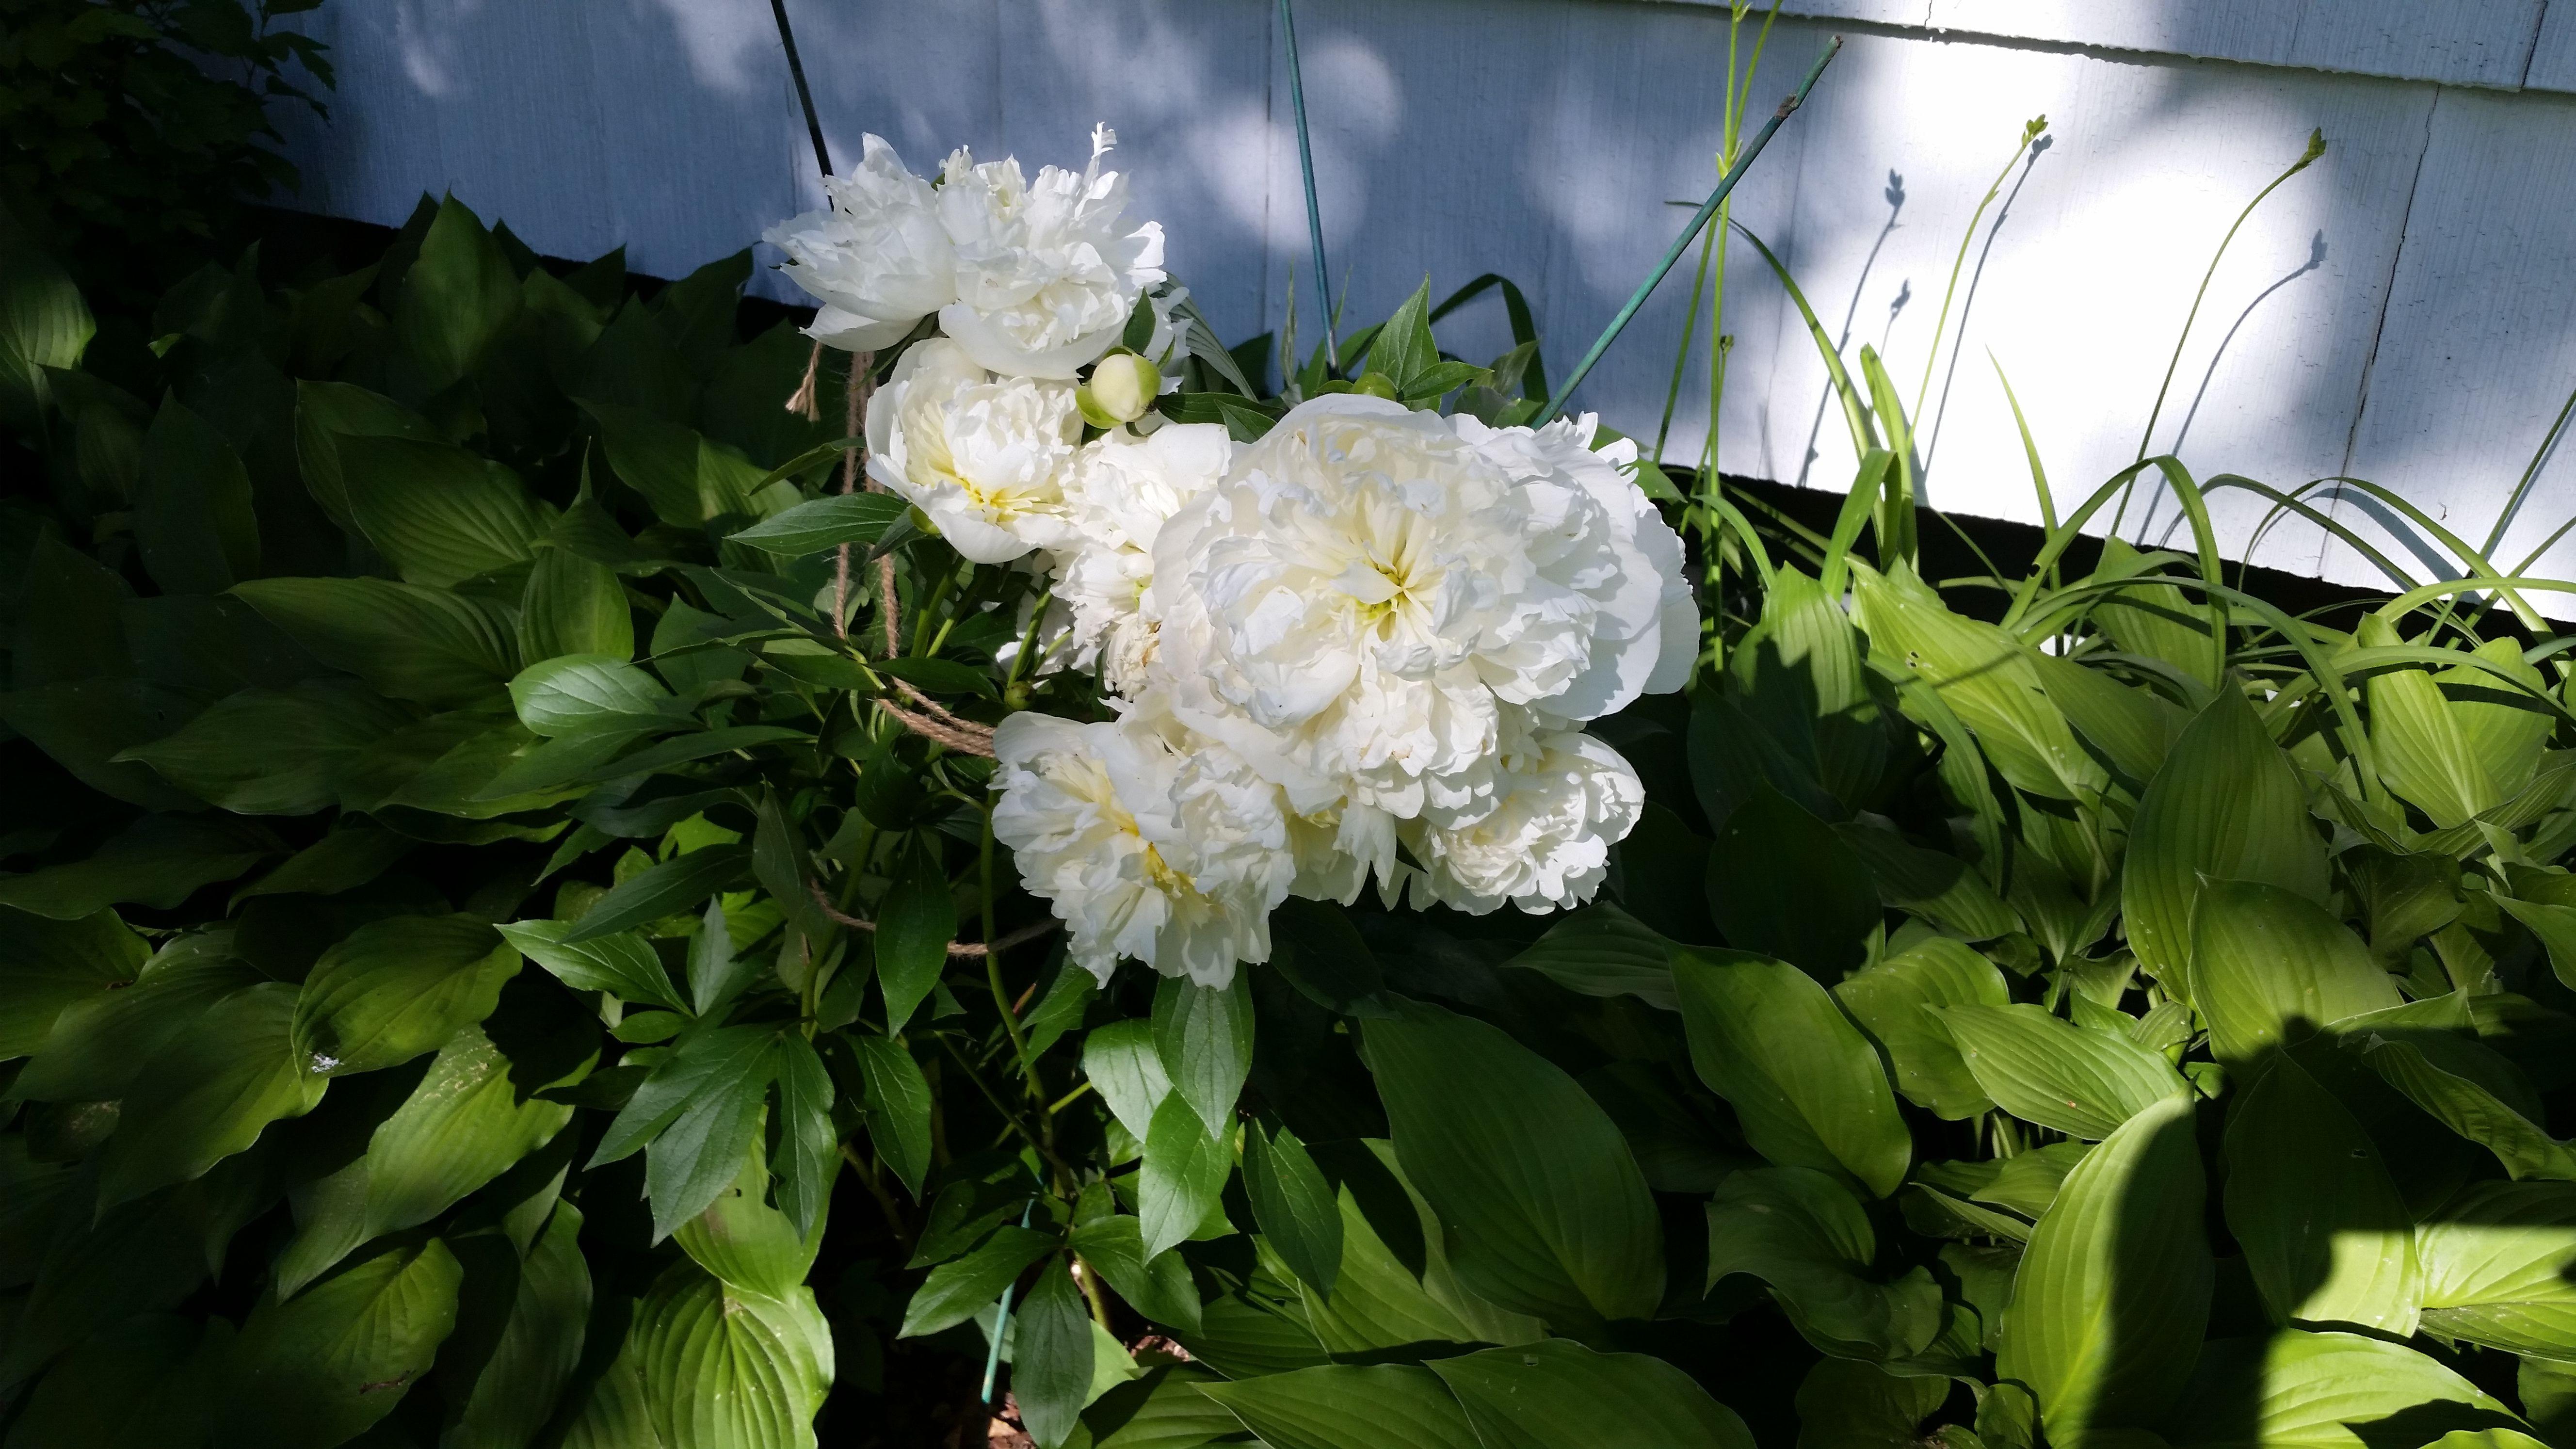 Peonies! #gardening #garden #DIY #home #flowers #roses #nature #landscaping #horticulture